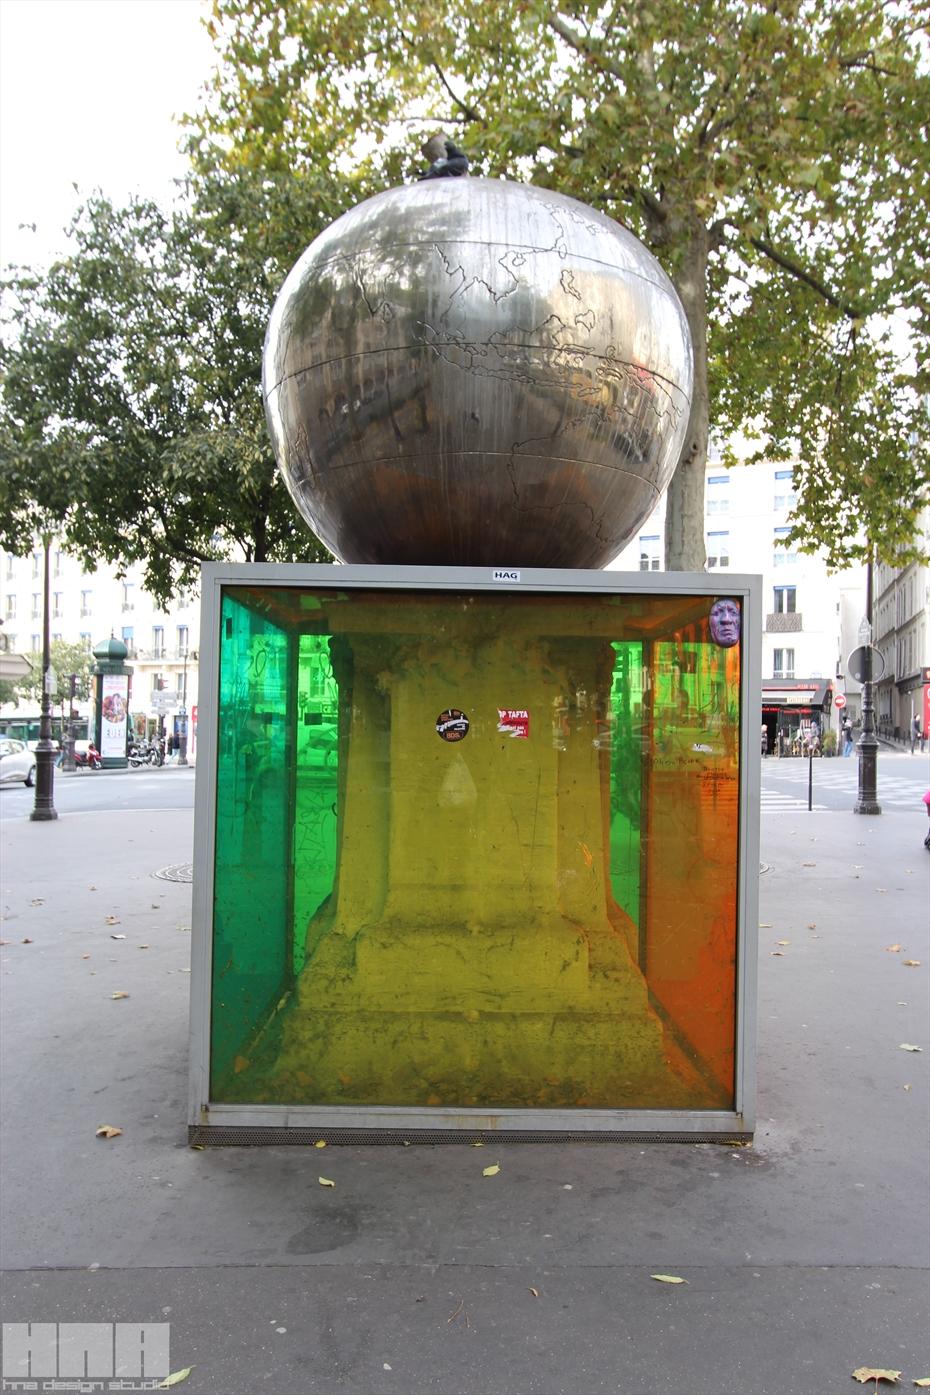 parizs erdekessegek 12